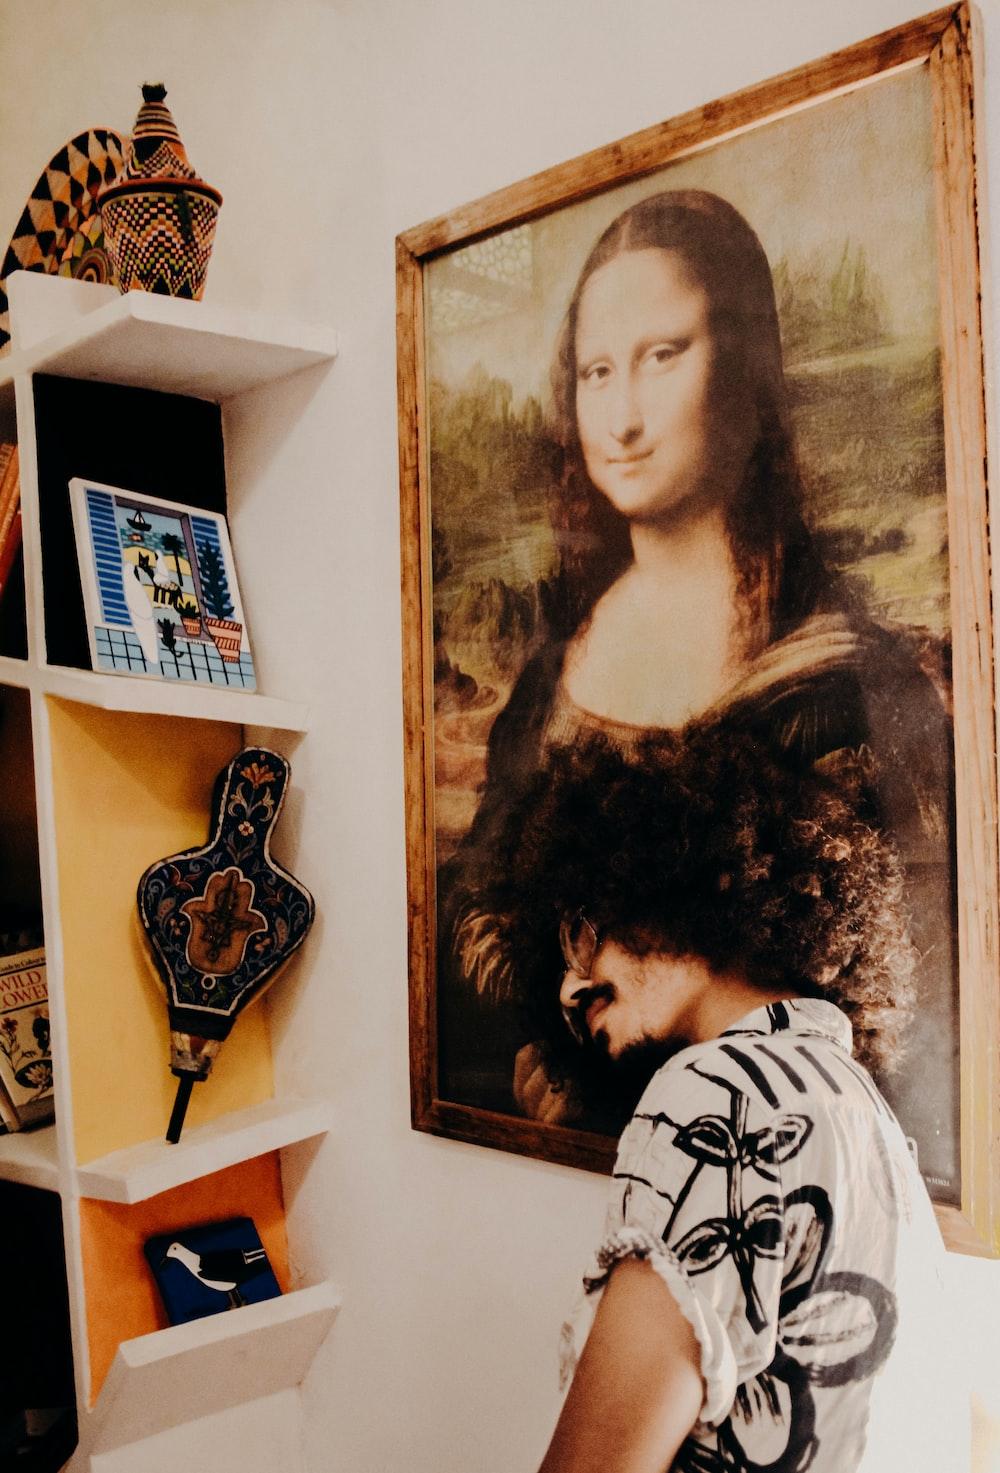 man standing near Mona Lisa painting